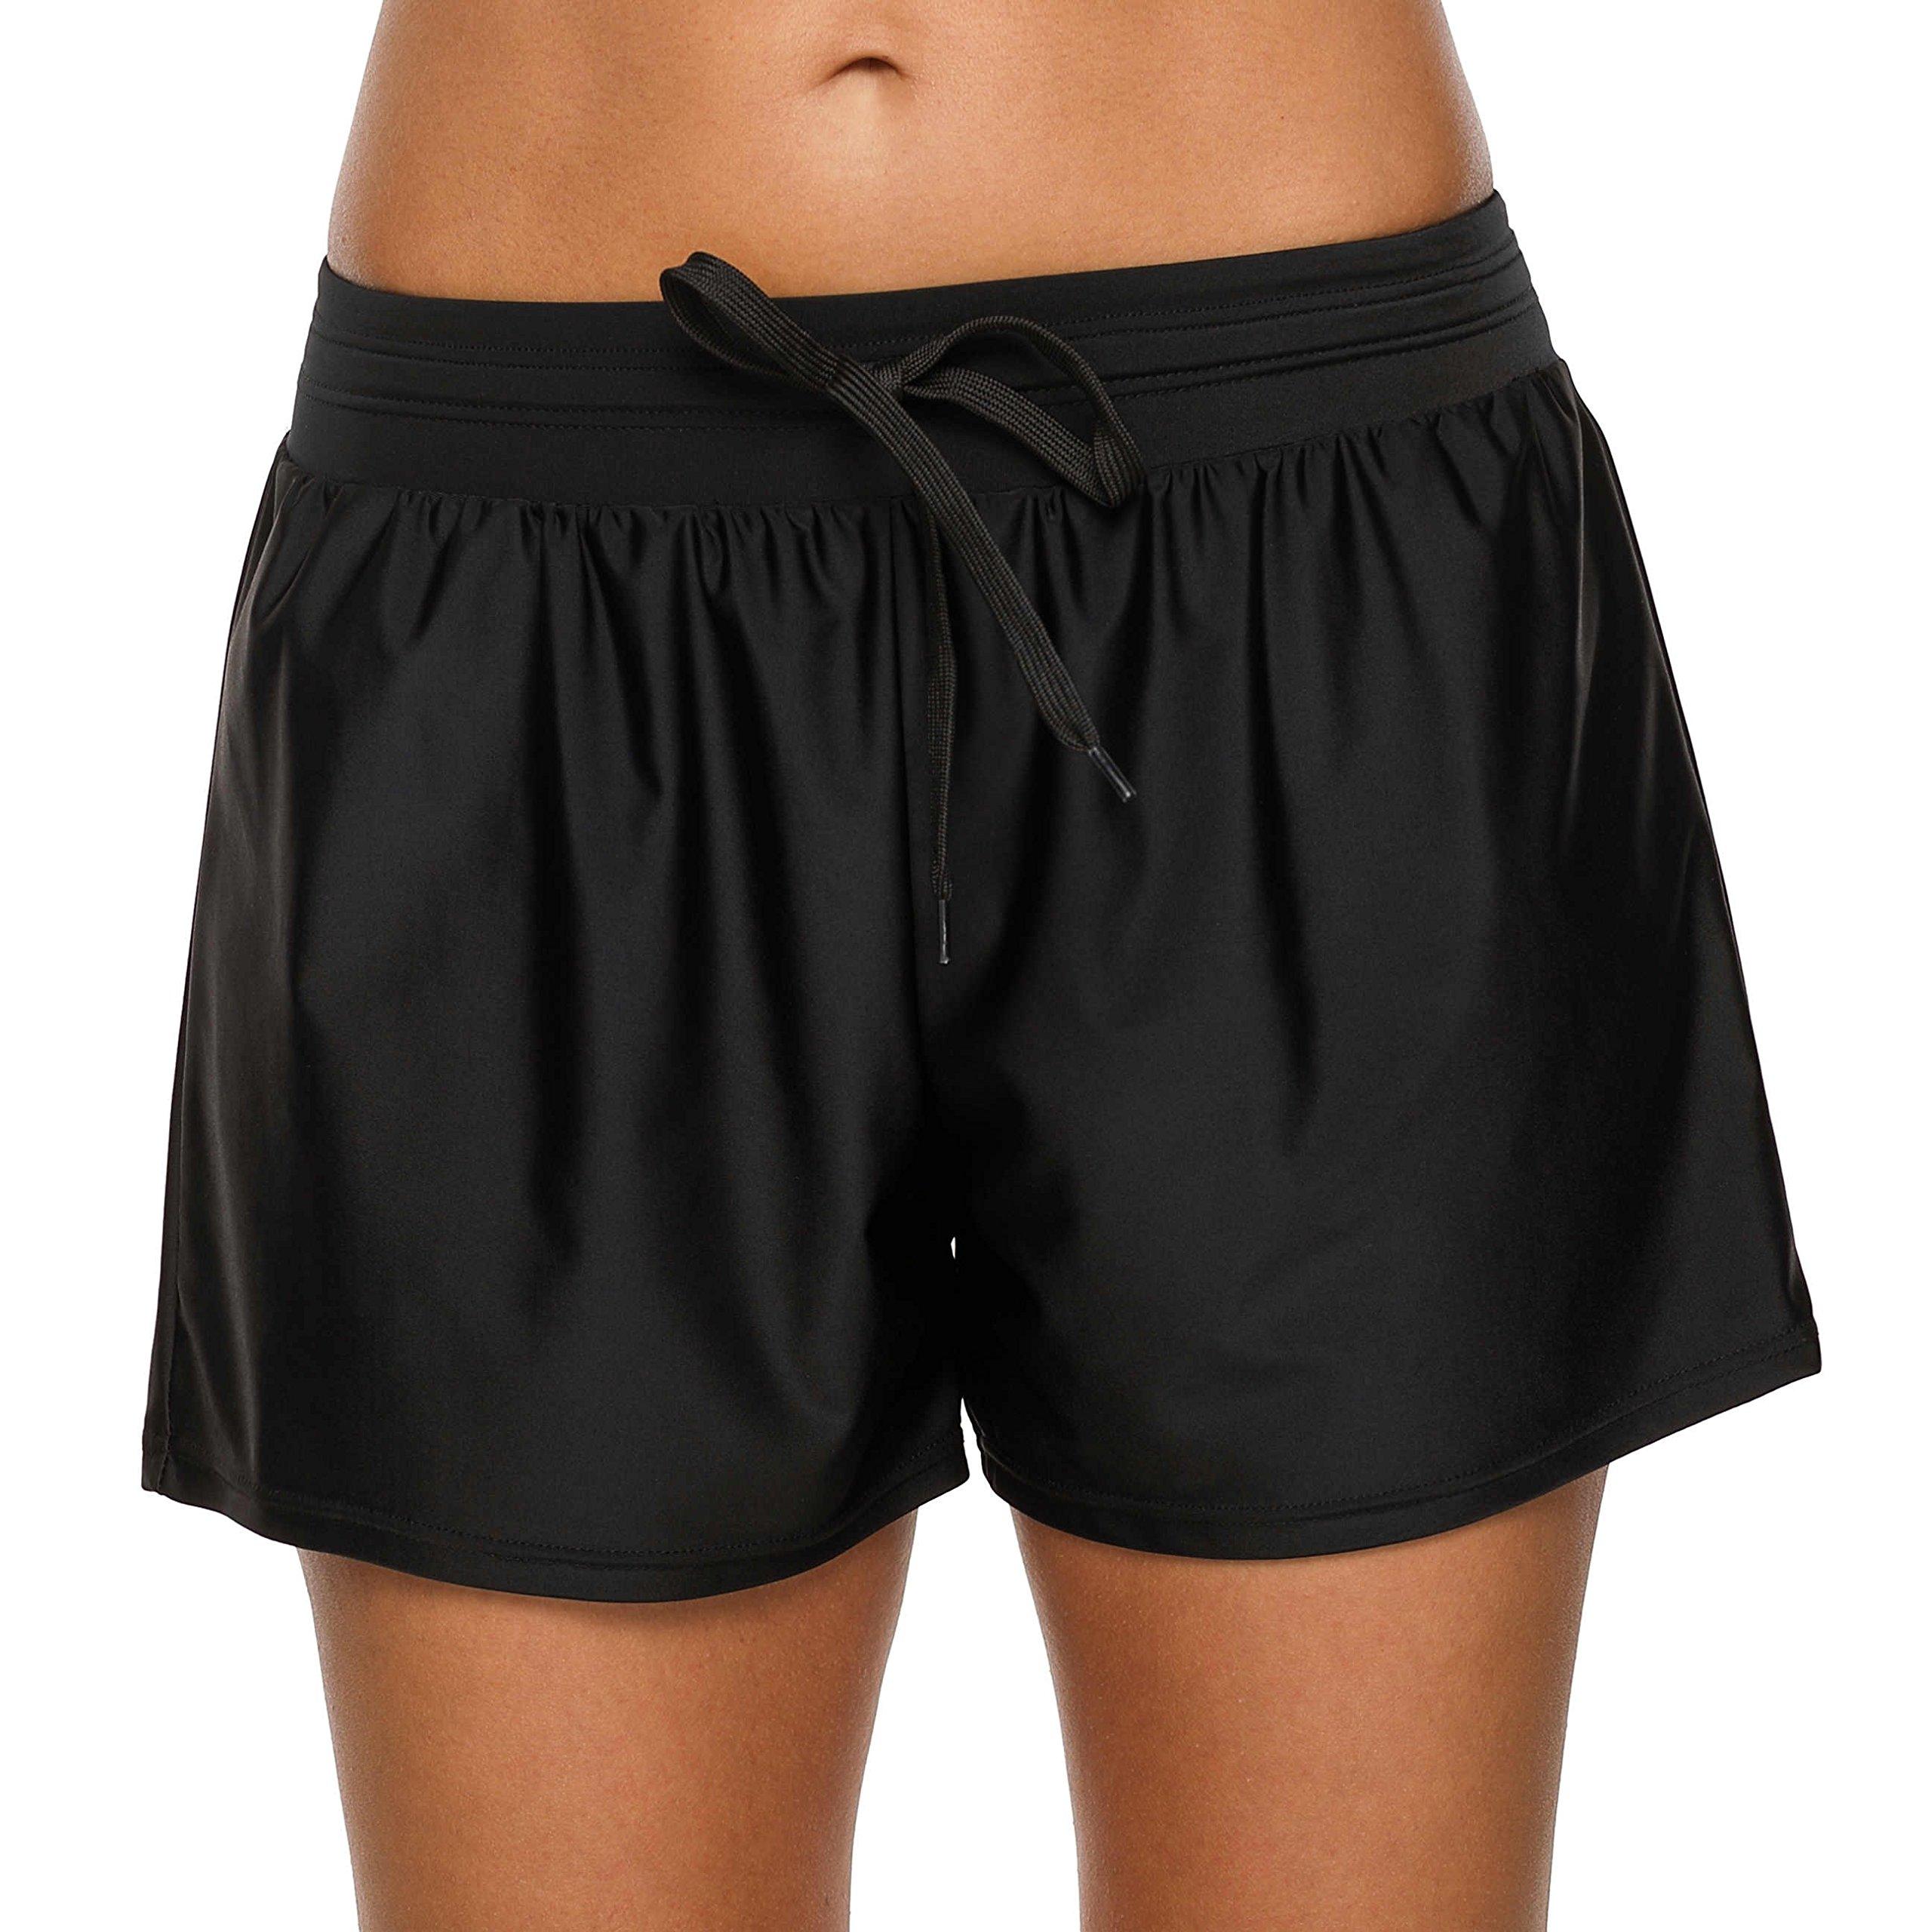 beautyin Womens Swim Bottoms Board Shorts Swimsuit Bathing Suit Shorts Black 2XL by beautyin (Image #1)